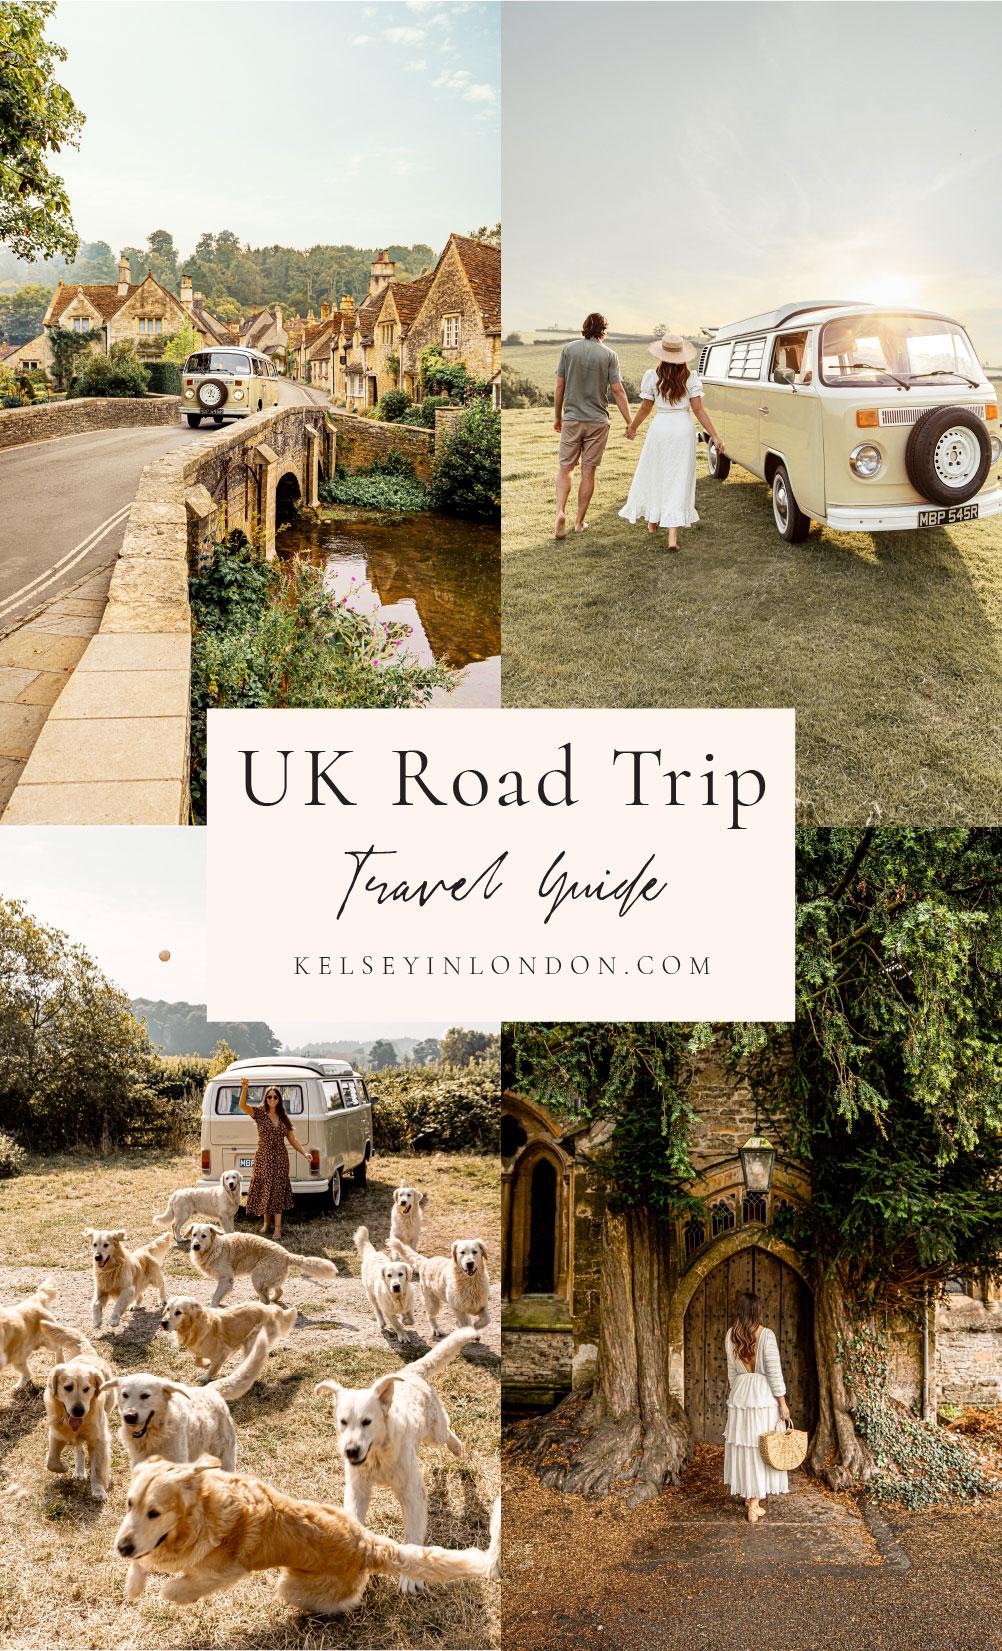 Uk road trip Somerset the cotswolds castle Combe Kelsey Heinrichs kelseyinlondon England travel camptoo campervan holiday